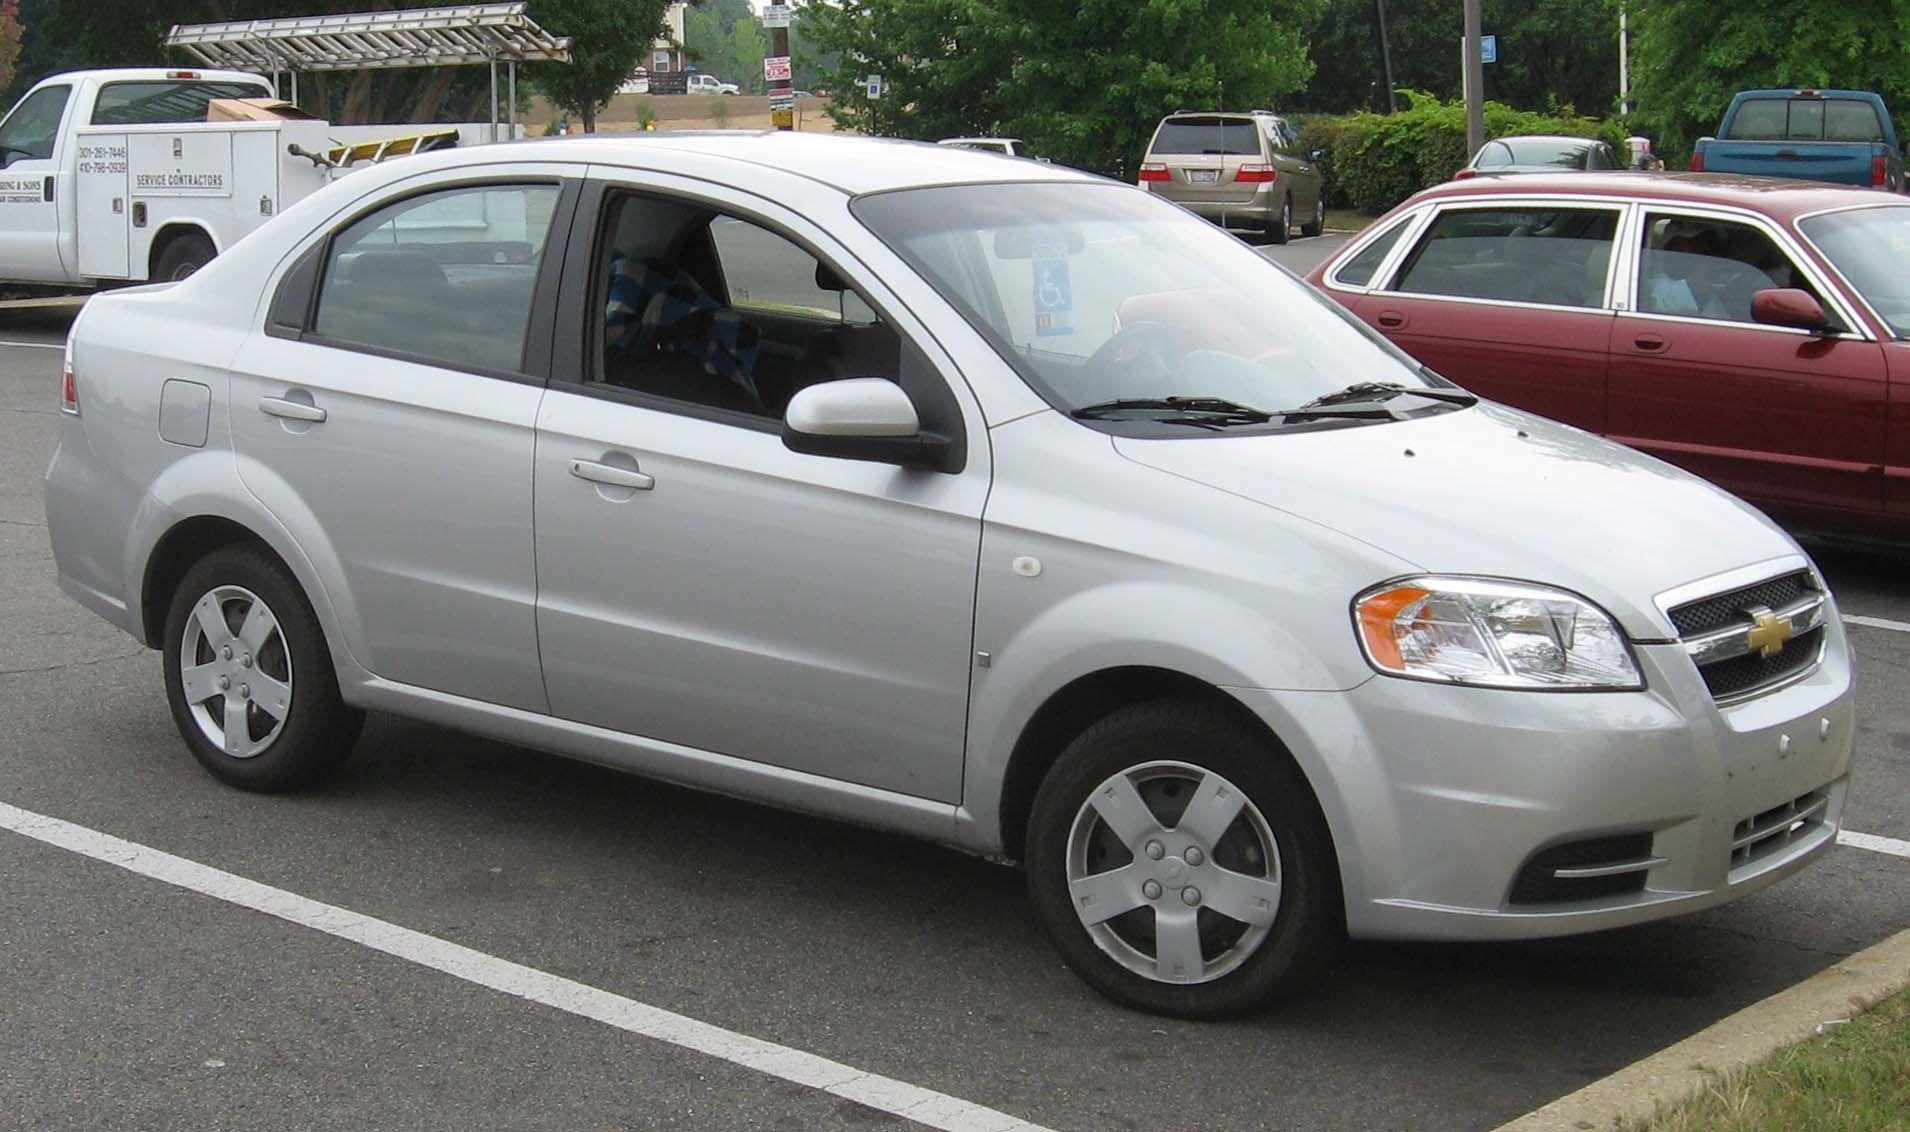 Chevrolet Aveo Ls Sedan Chevrolet Aveo Chevrolet Aveo Car